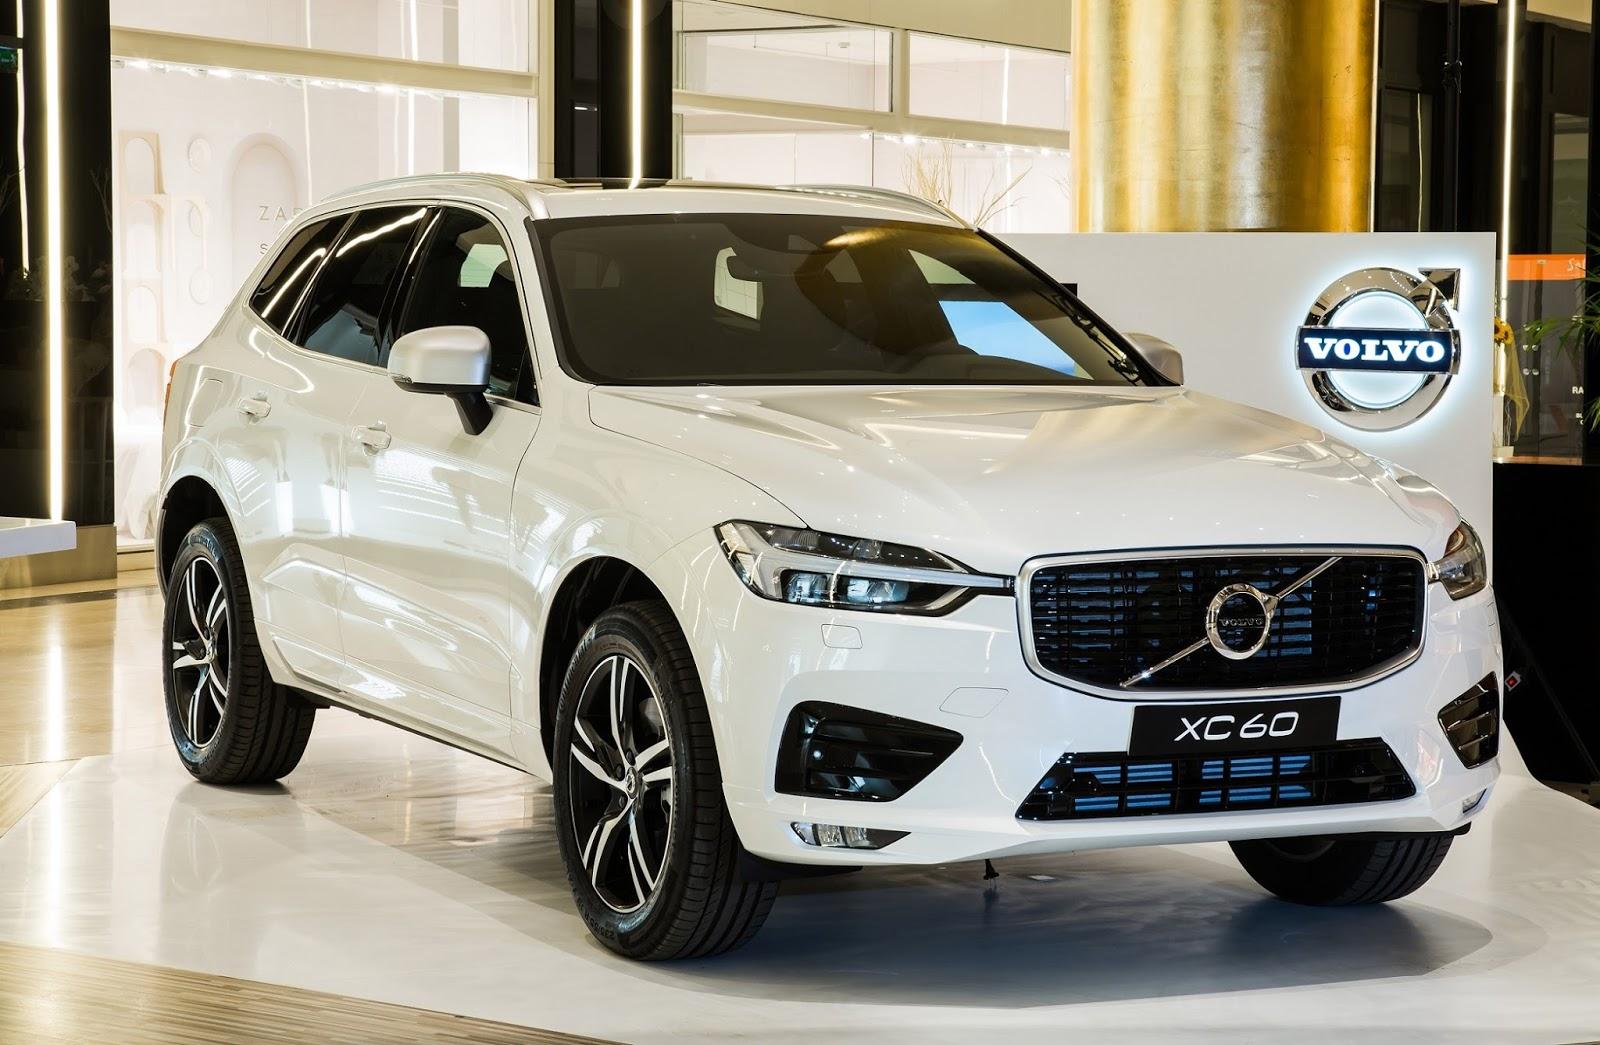 NEW2BVOLVO2BXC602B2540GOLDEN2BHALL CRYSTAL2BWHITE2BPEARL 1 Από 53.490 ευρώ οι τιμές του νέου XC60 Volvo, Volvo XC60, αυτοκίνητα, καινούργιο, καινούρια, τιμες